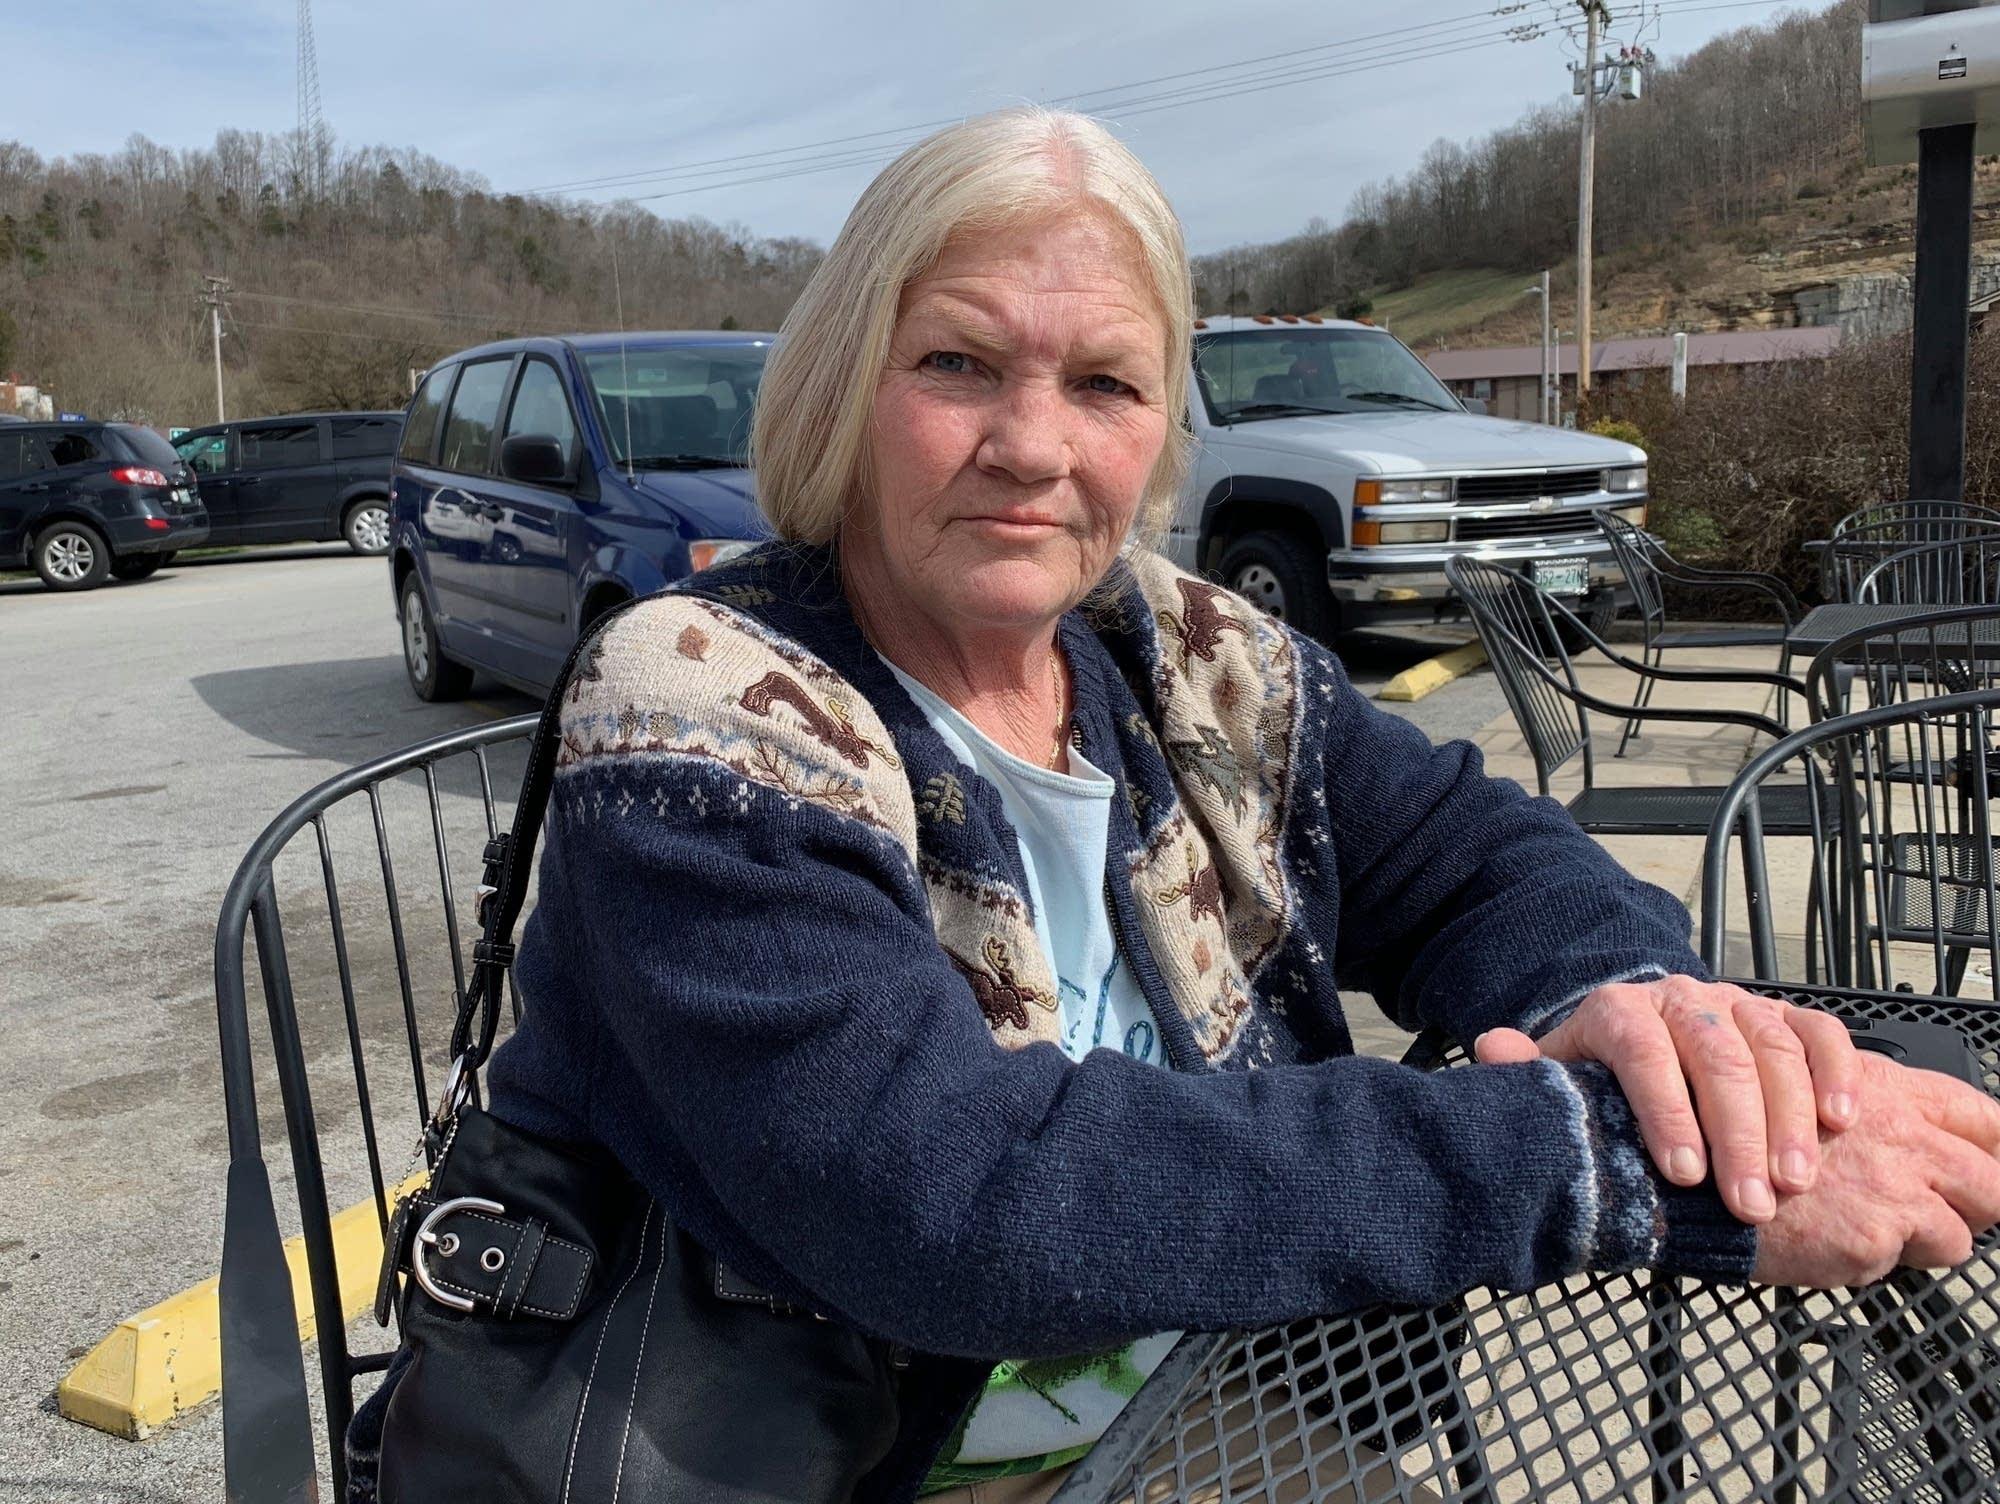 Gail Gray suffers from degenerative disc disease